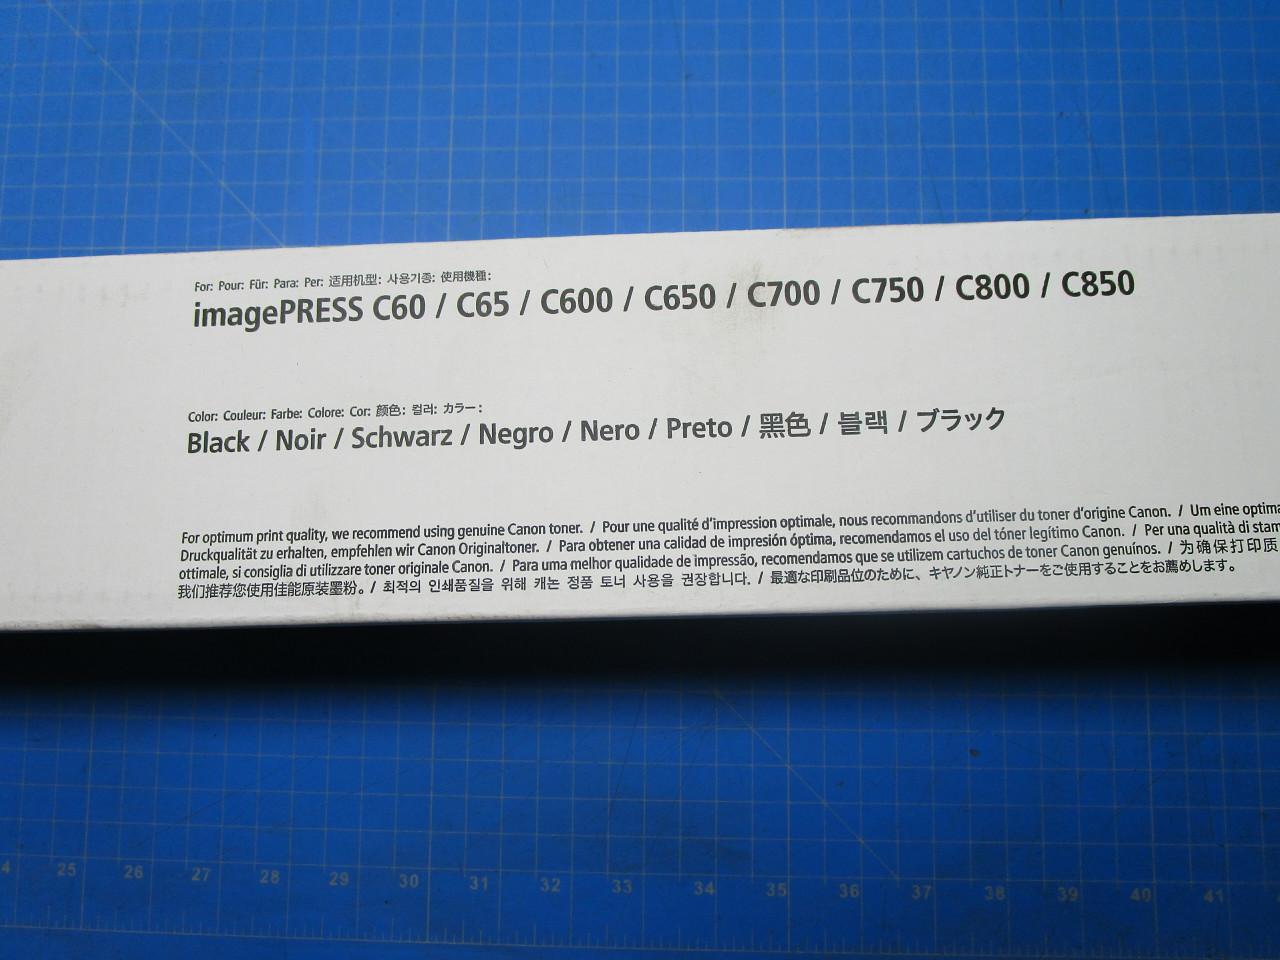 CANON 8066B001AA F429301001 F42-9301-001 T01 TONER CARTRIDGE BLACK C700 C800 P02-000992